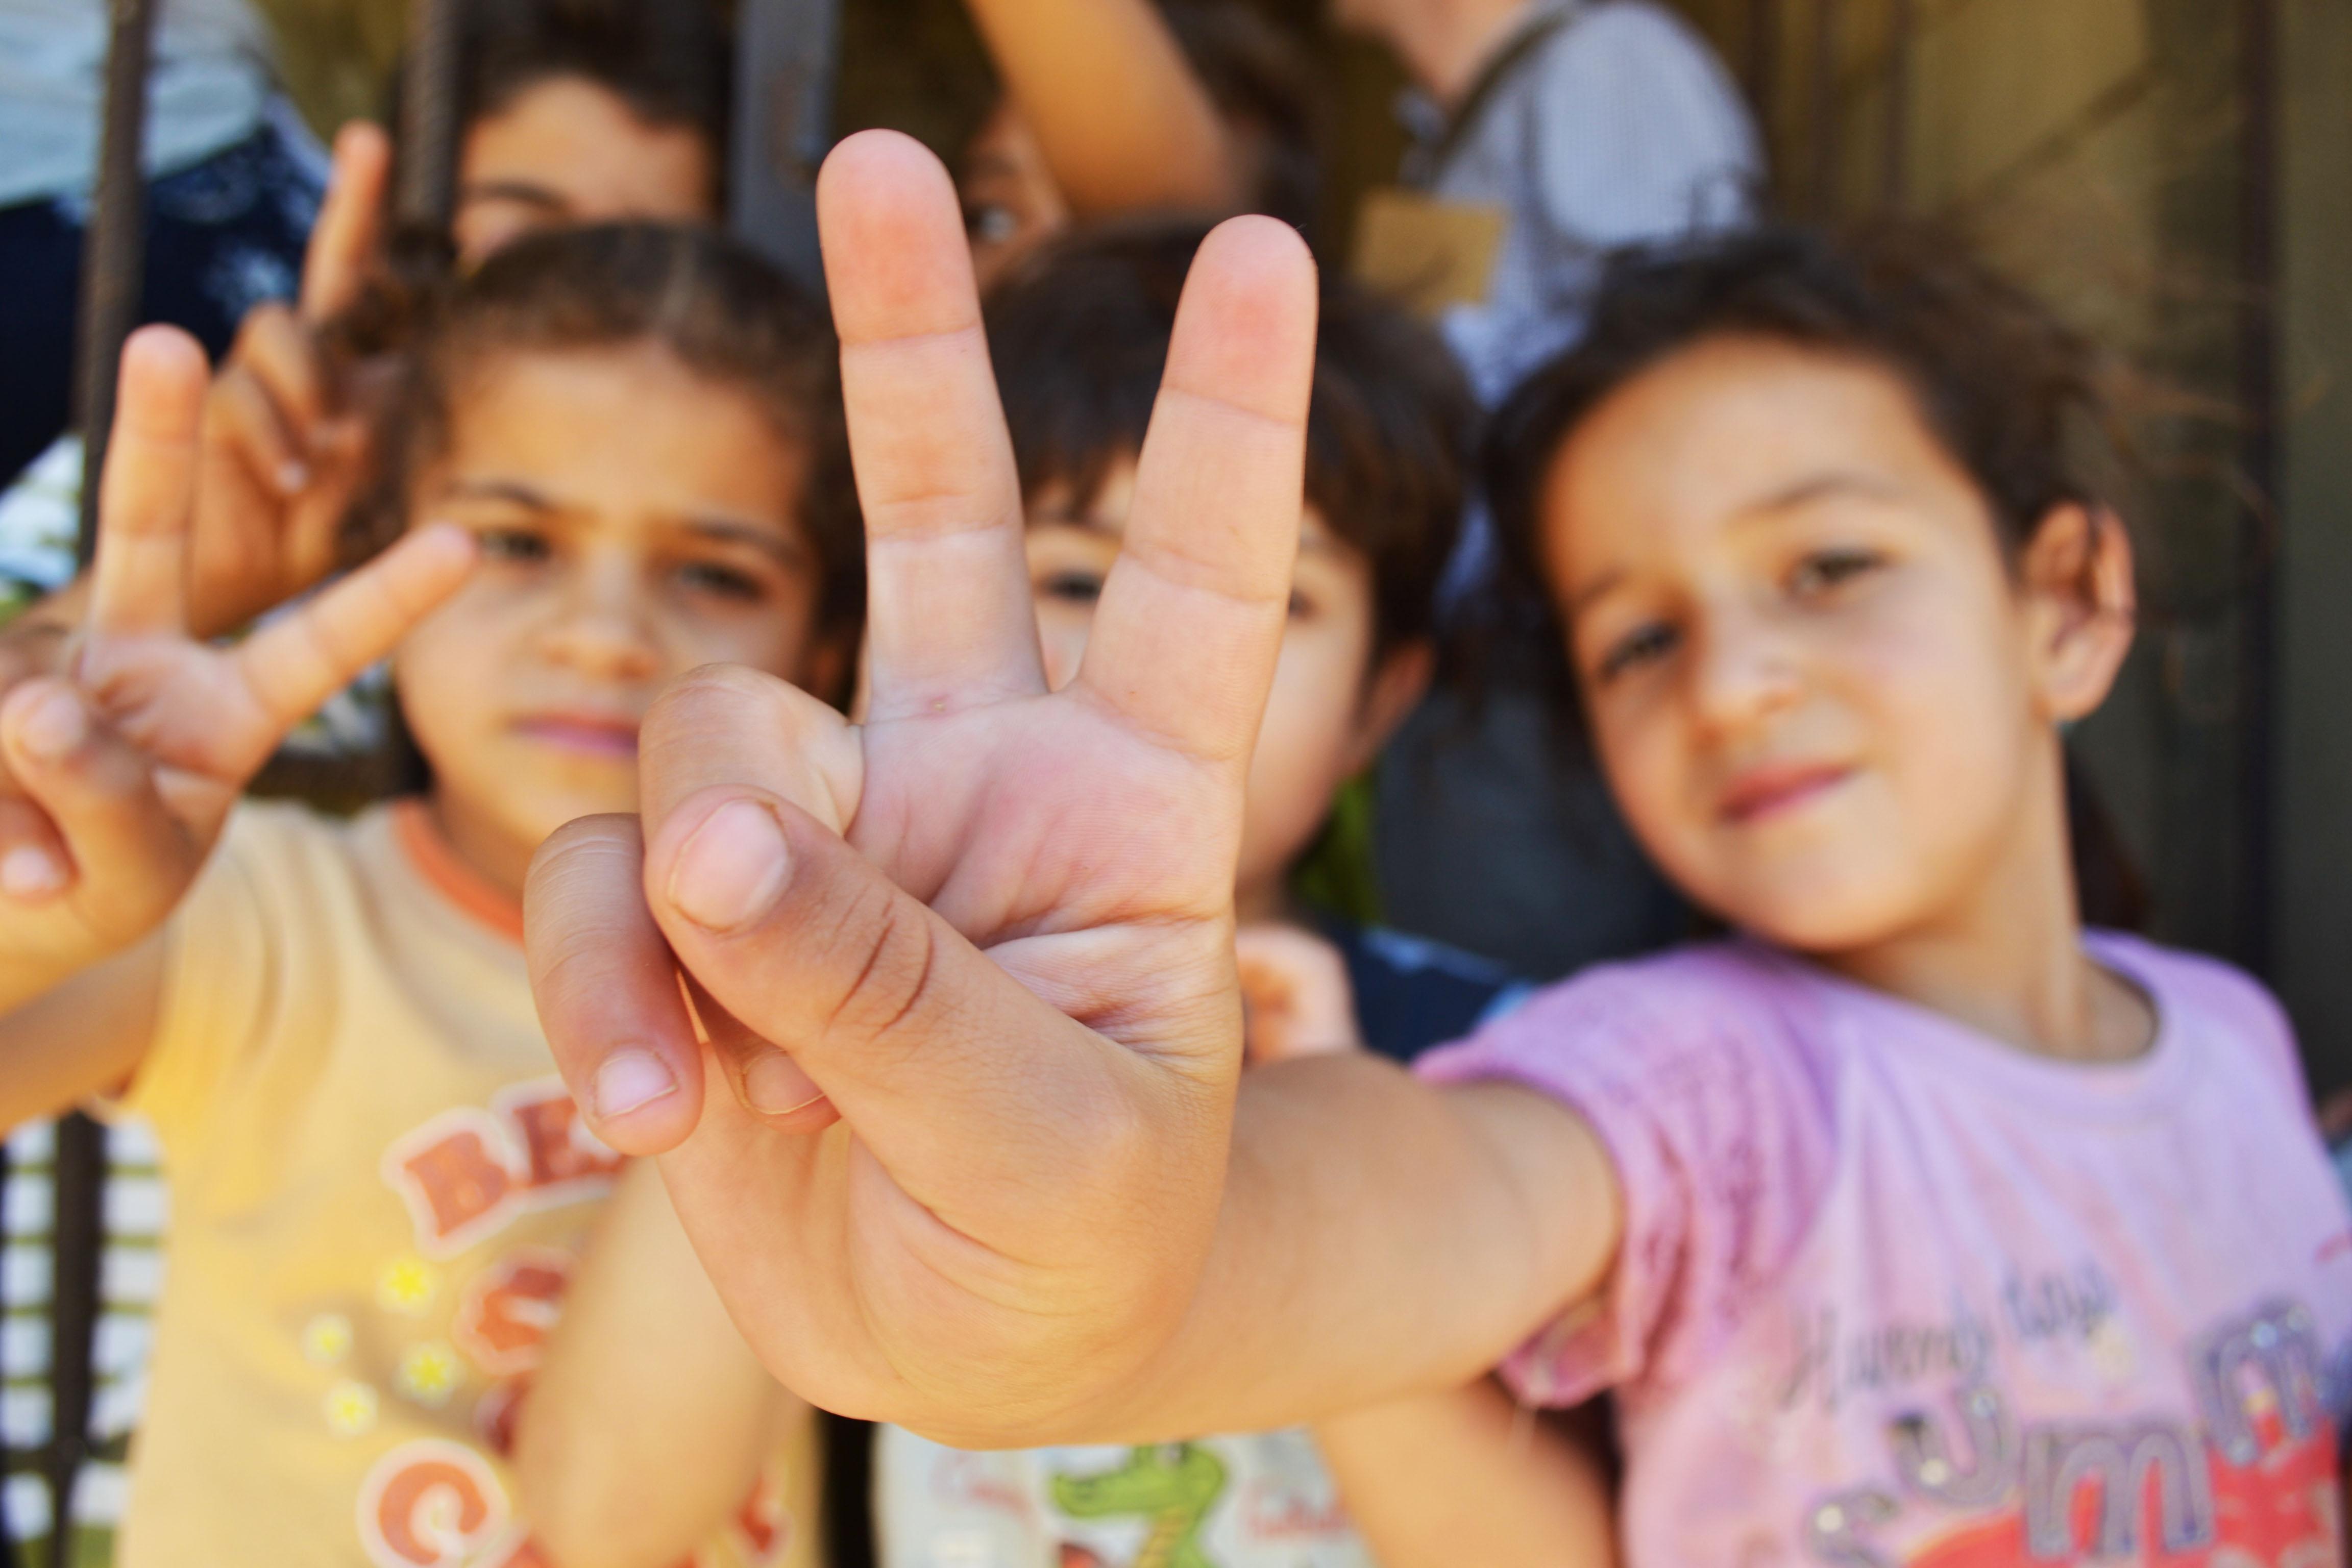 Syrian peace talks point to Gospel opportunity